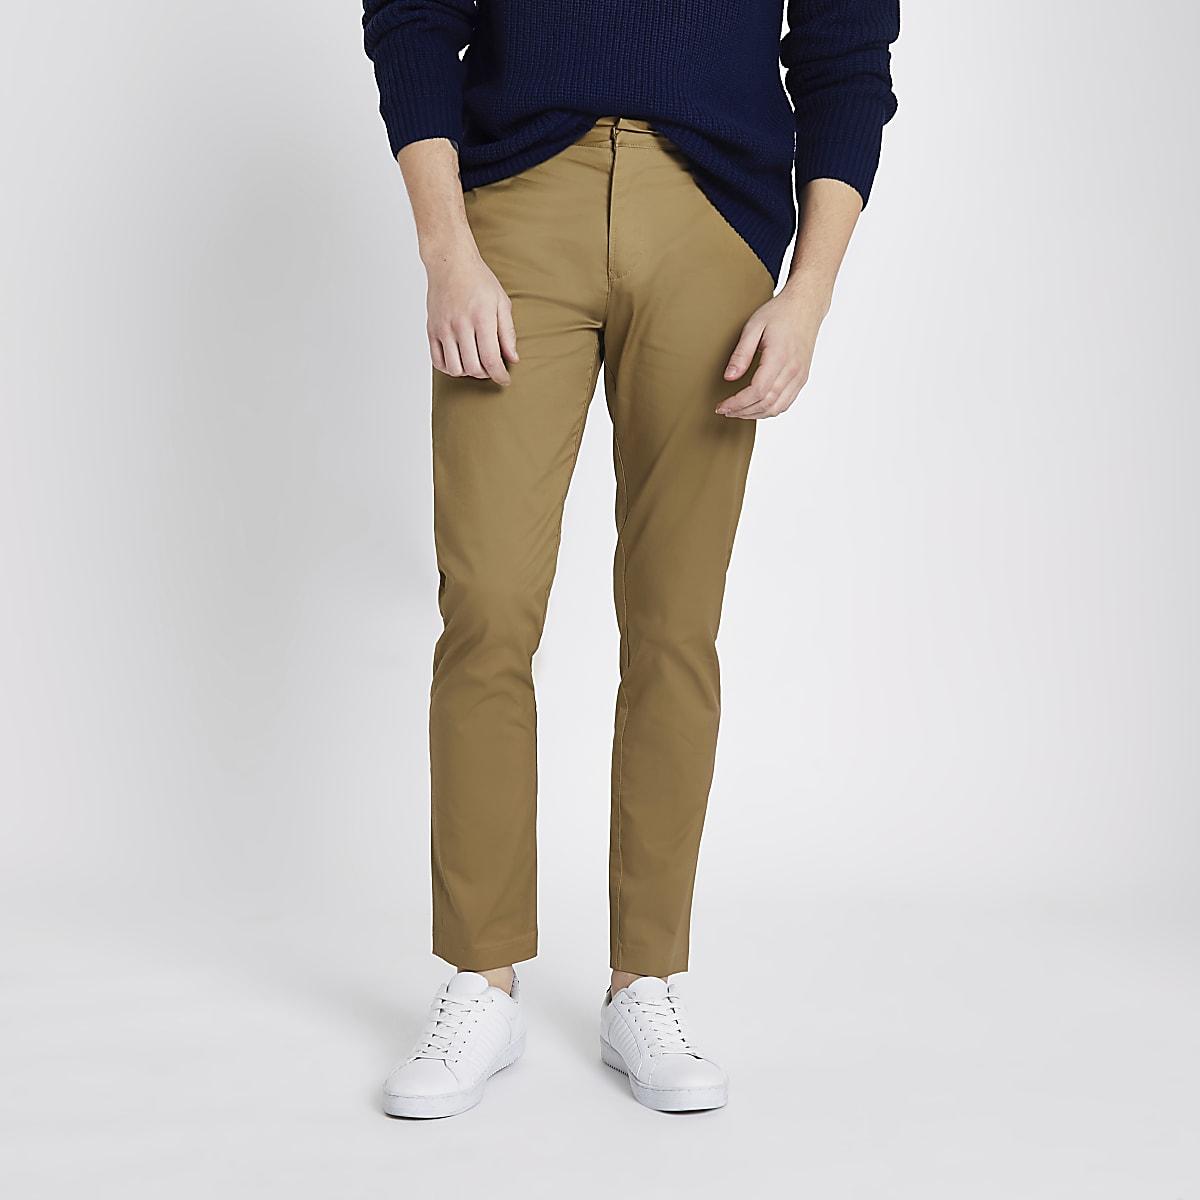 Tan skinny chino trousers